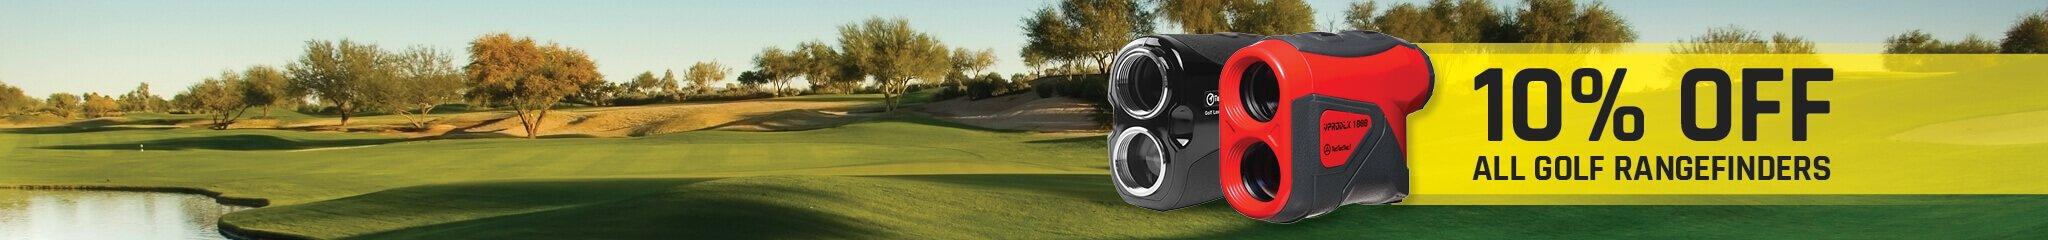 DP_BATEC261088725 PGA Championship Sale Web_2048x240-2